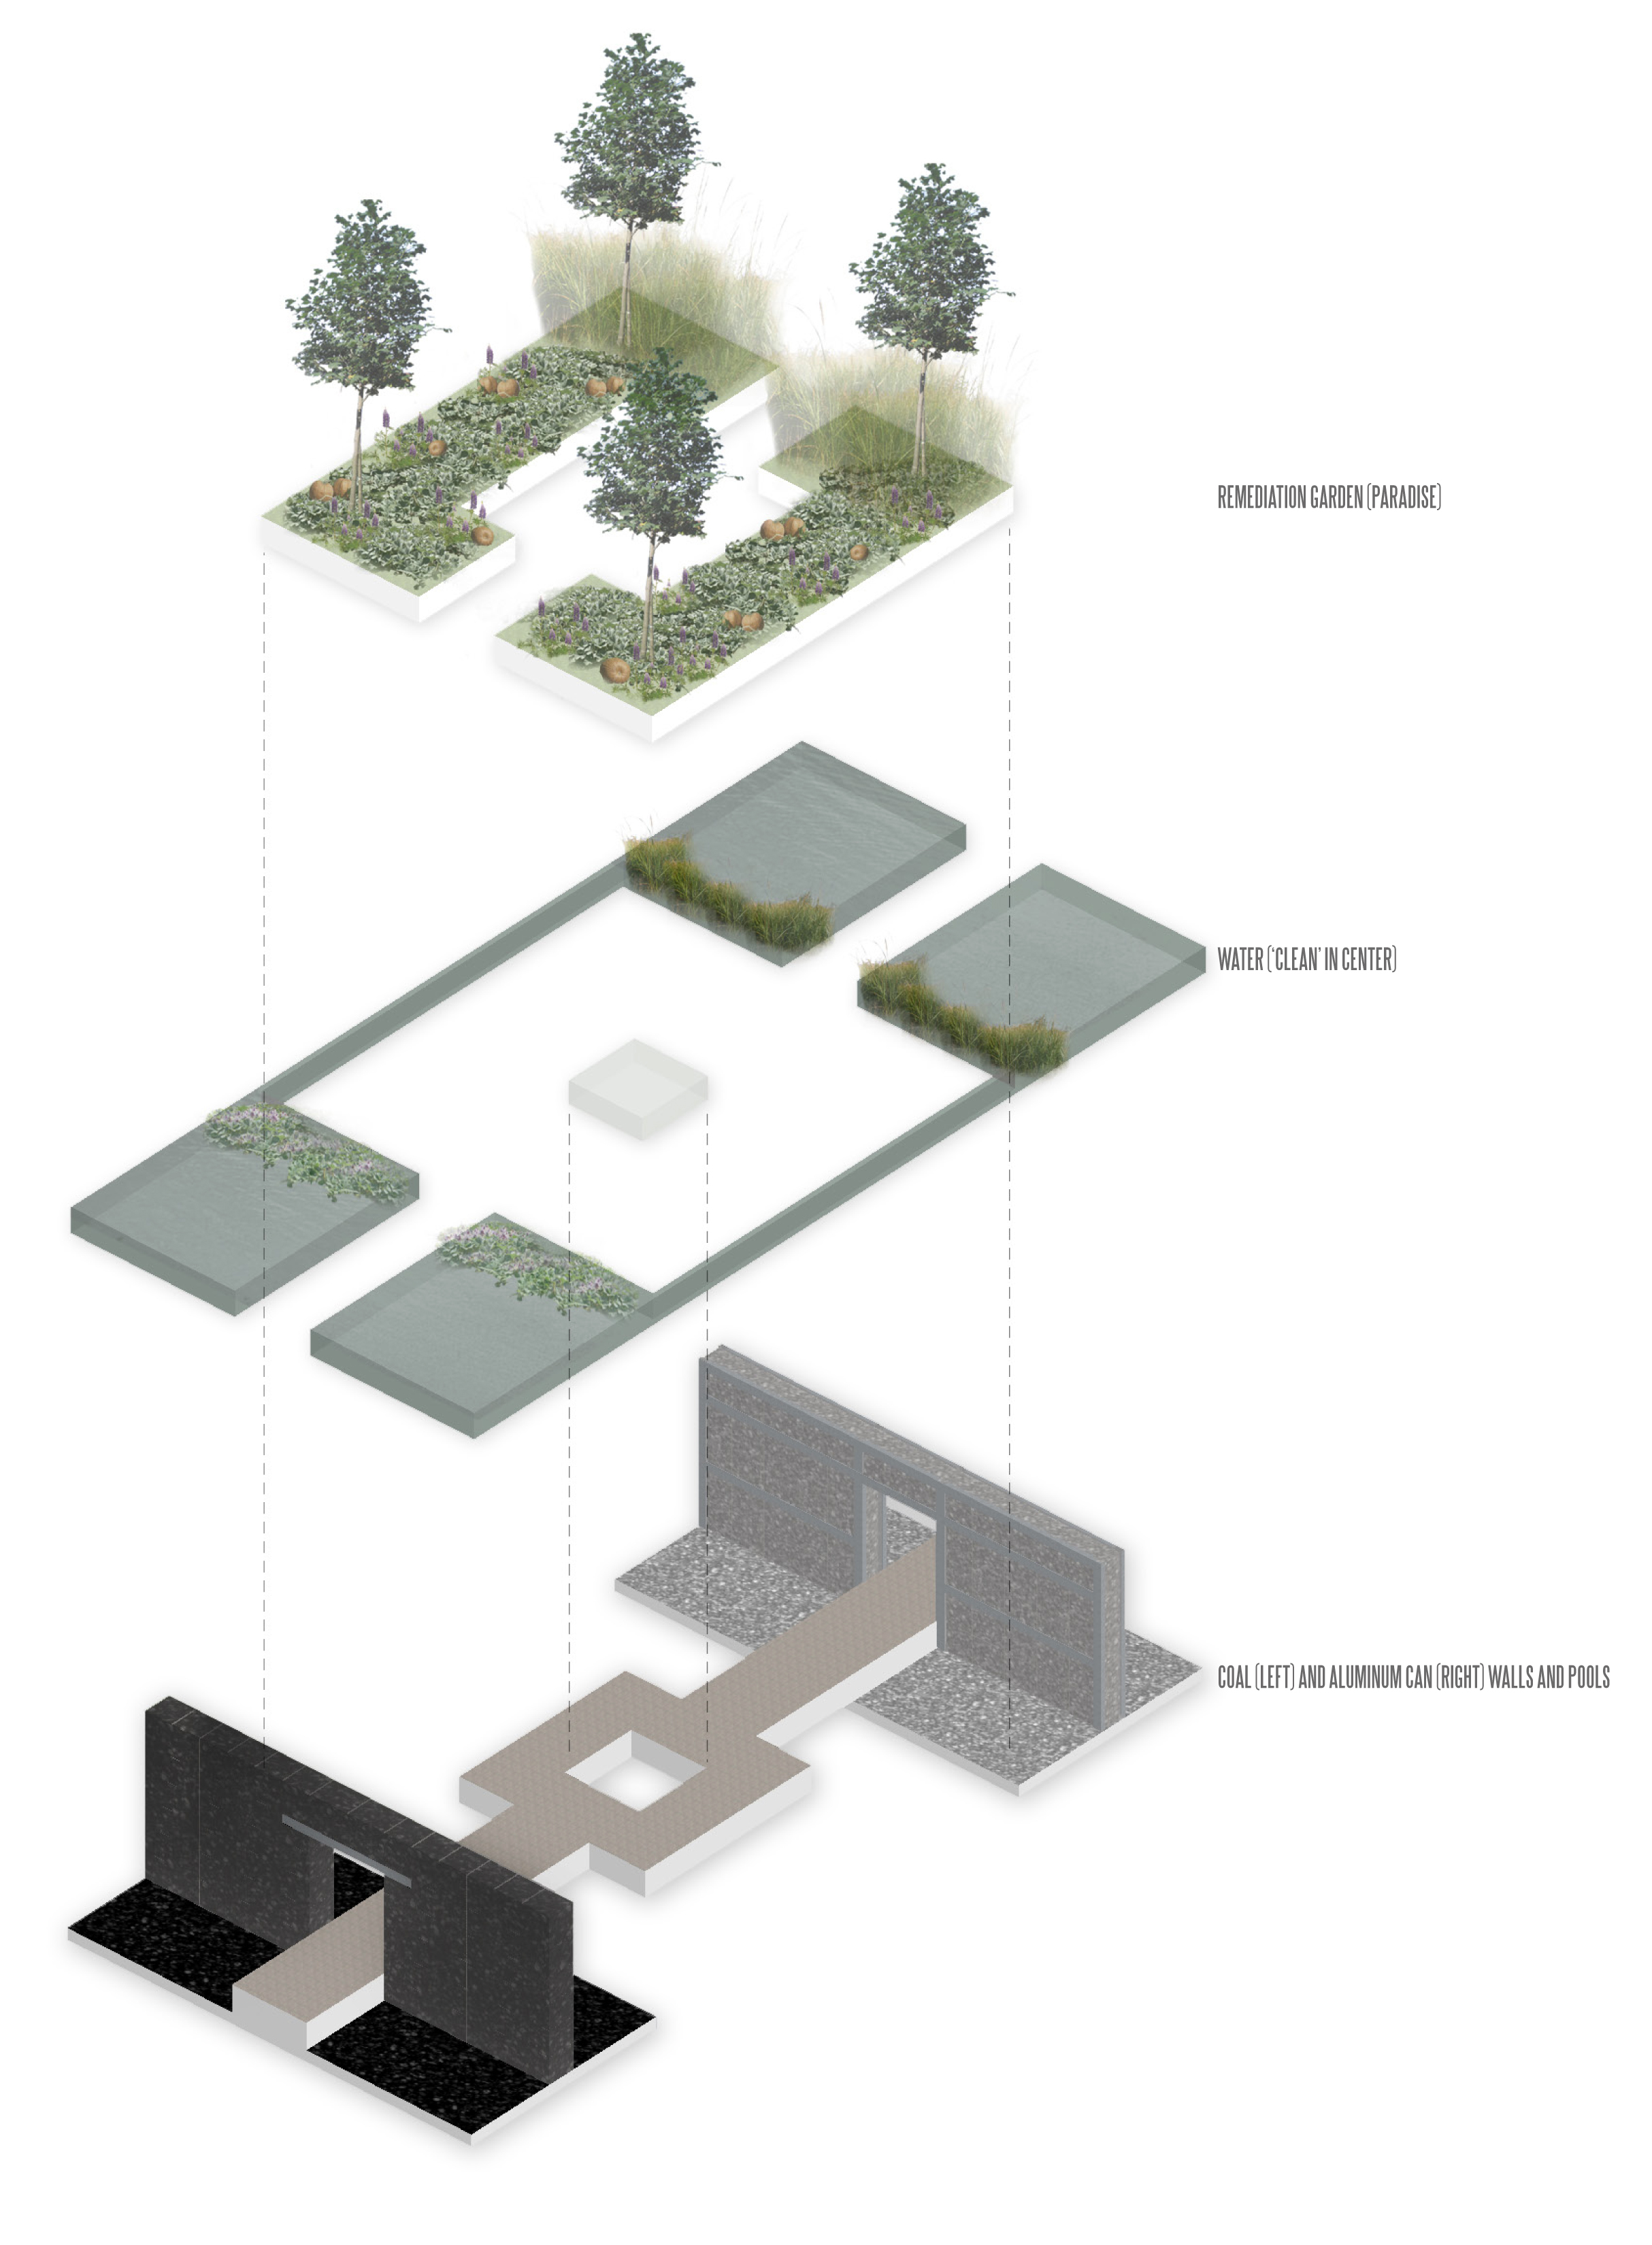 Axonometric showing the garden elements.